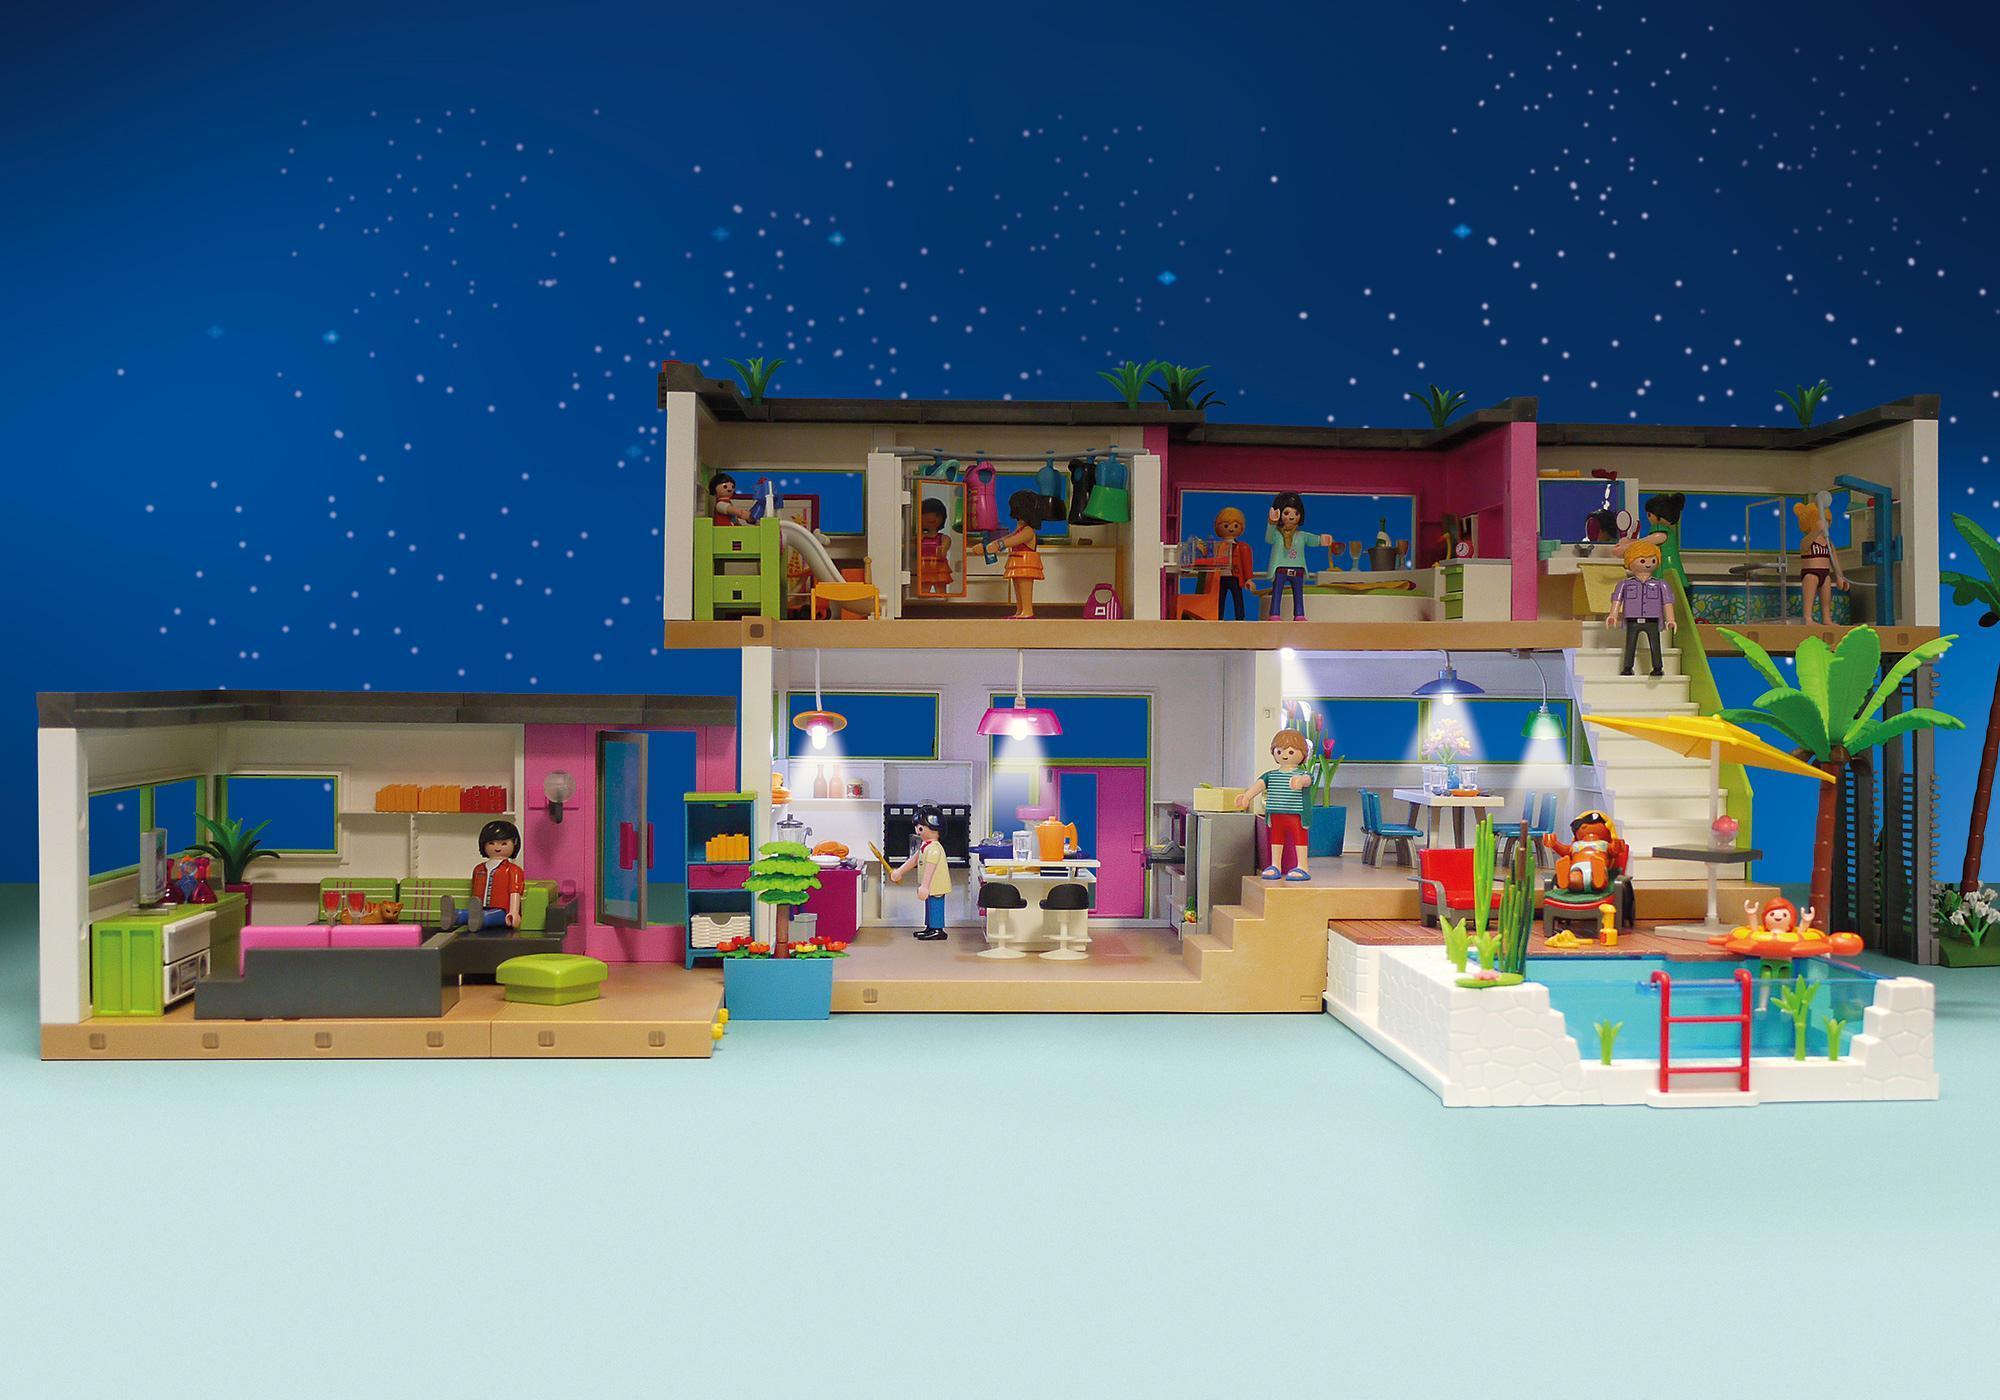 http://media.playmobil.com/i/playmobil/6354_product_extra1/Beleuchtungs-Set für die Moderne Luxusvilla